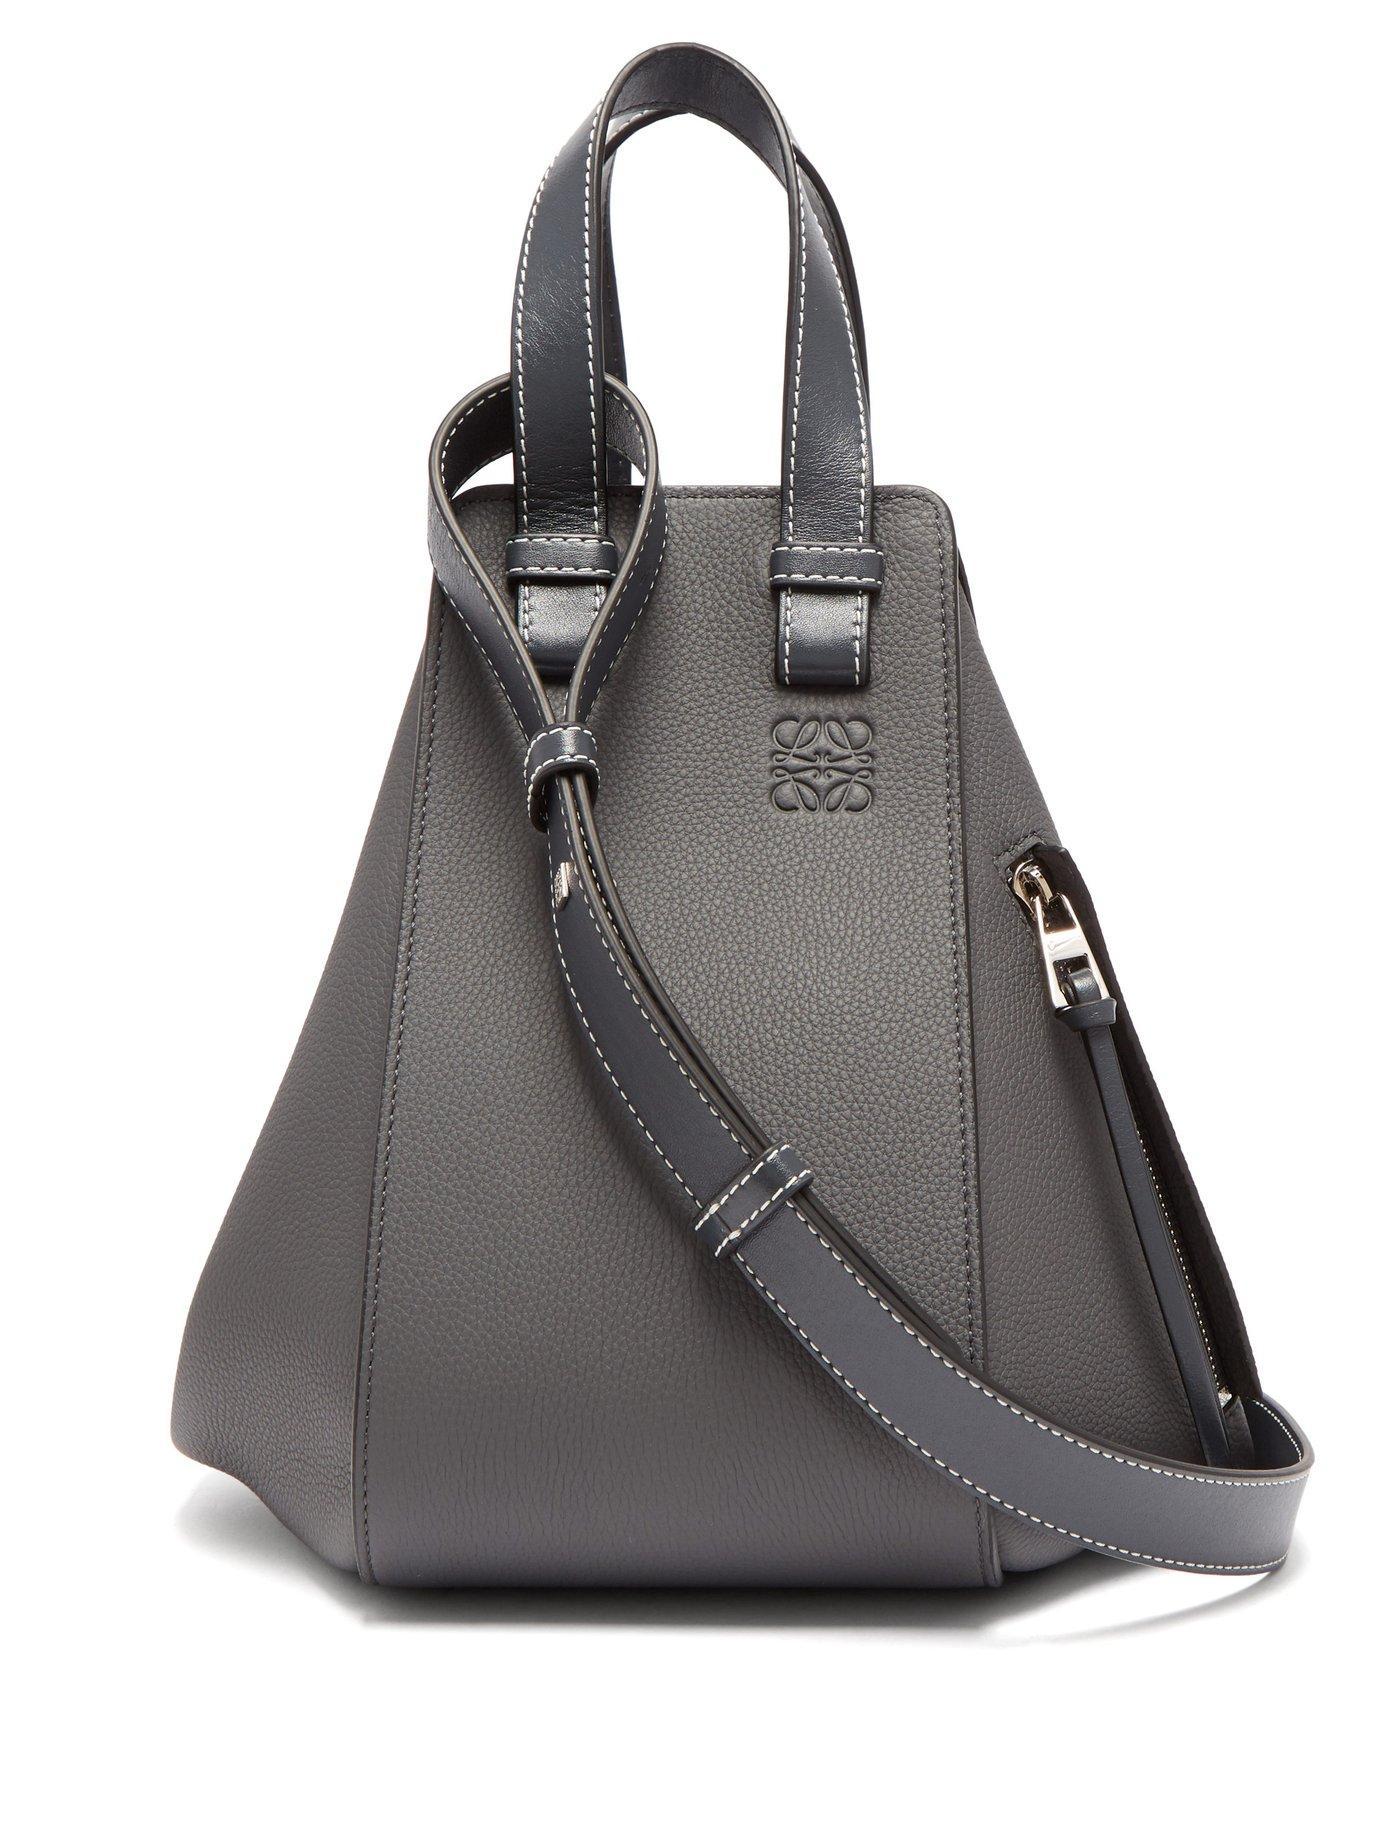 70754bea67 Loewe - Hammock Small Grained Leather Bag - Womens - Dark Grey ...